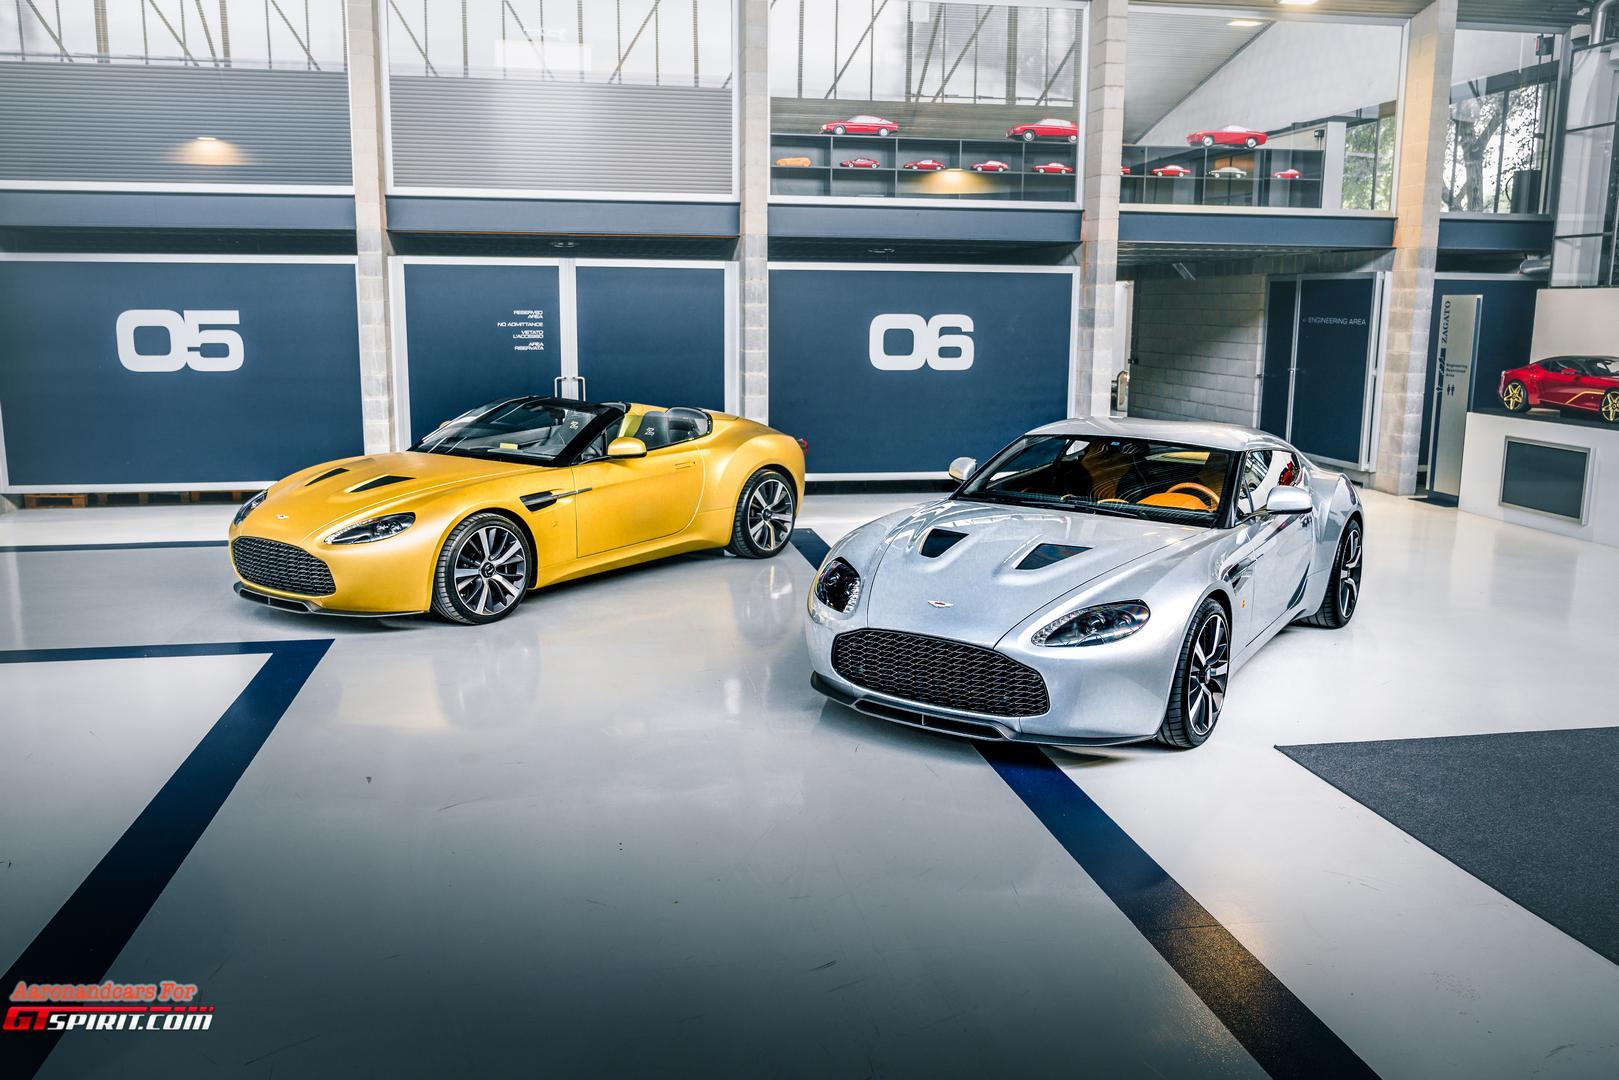 Aston Martin V12 Heritage Twins: The Return of the V12 Zagato